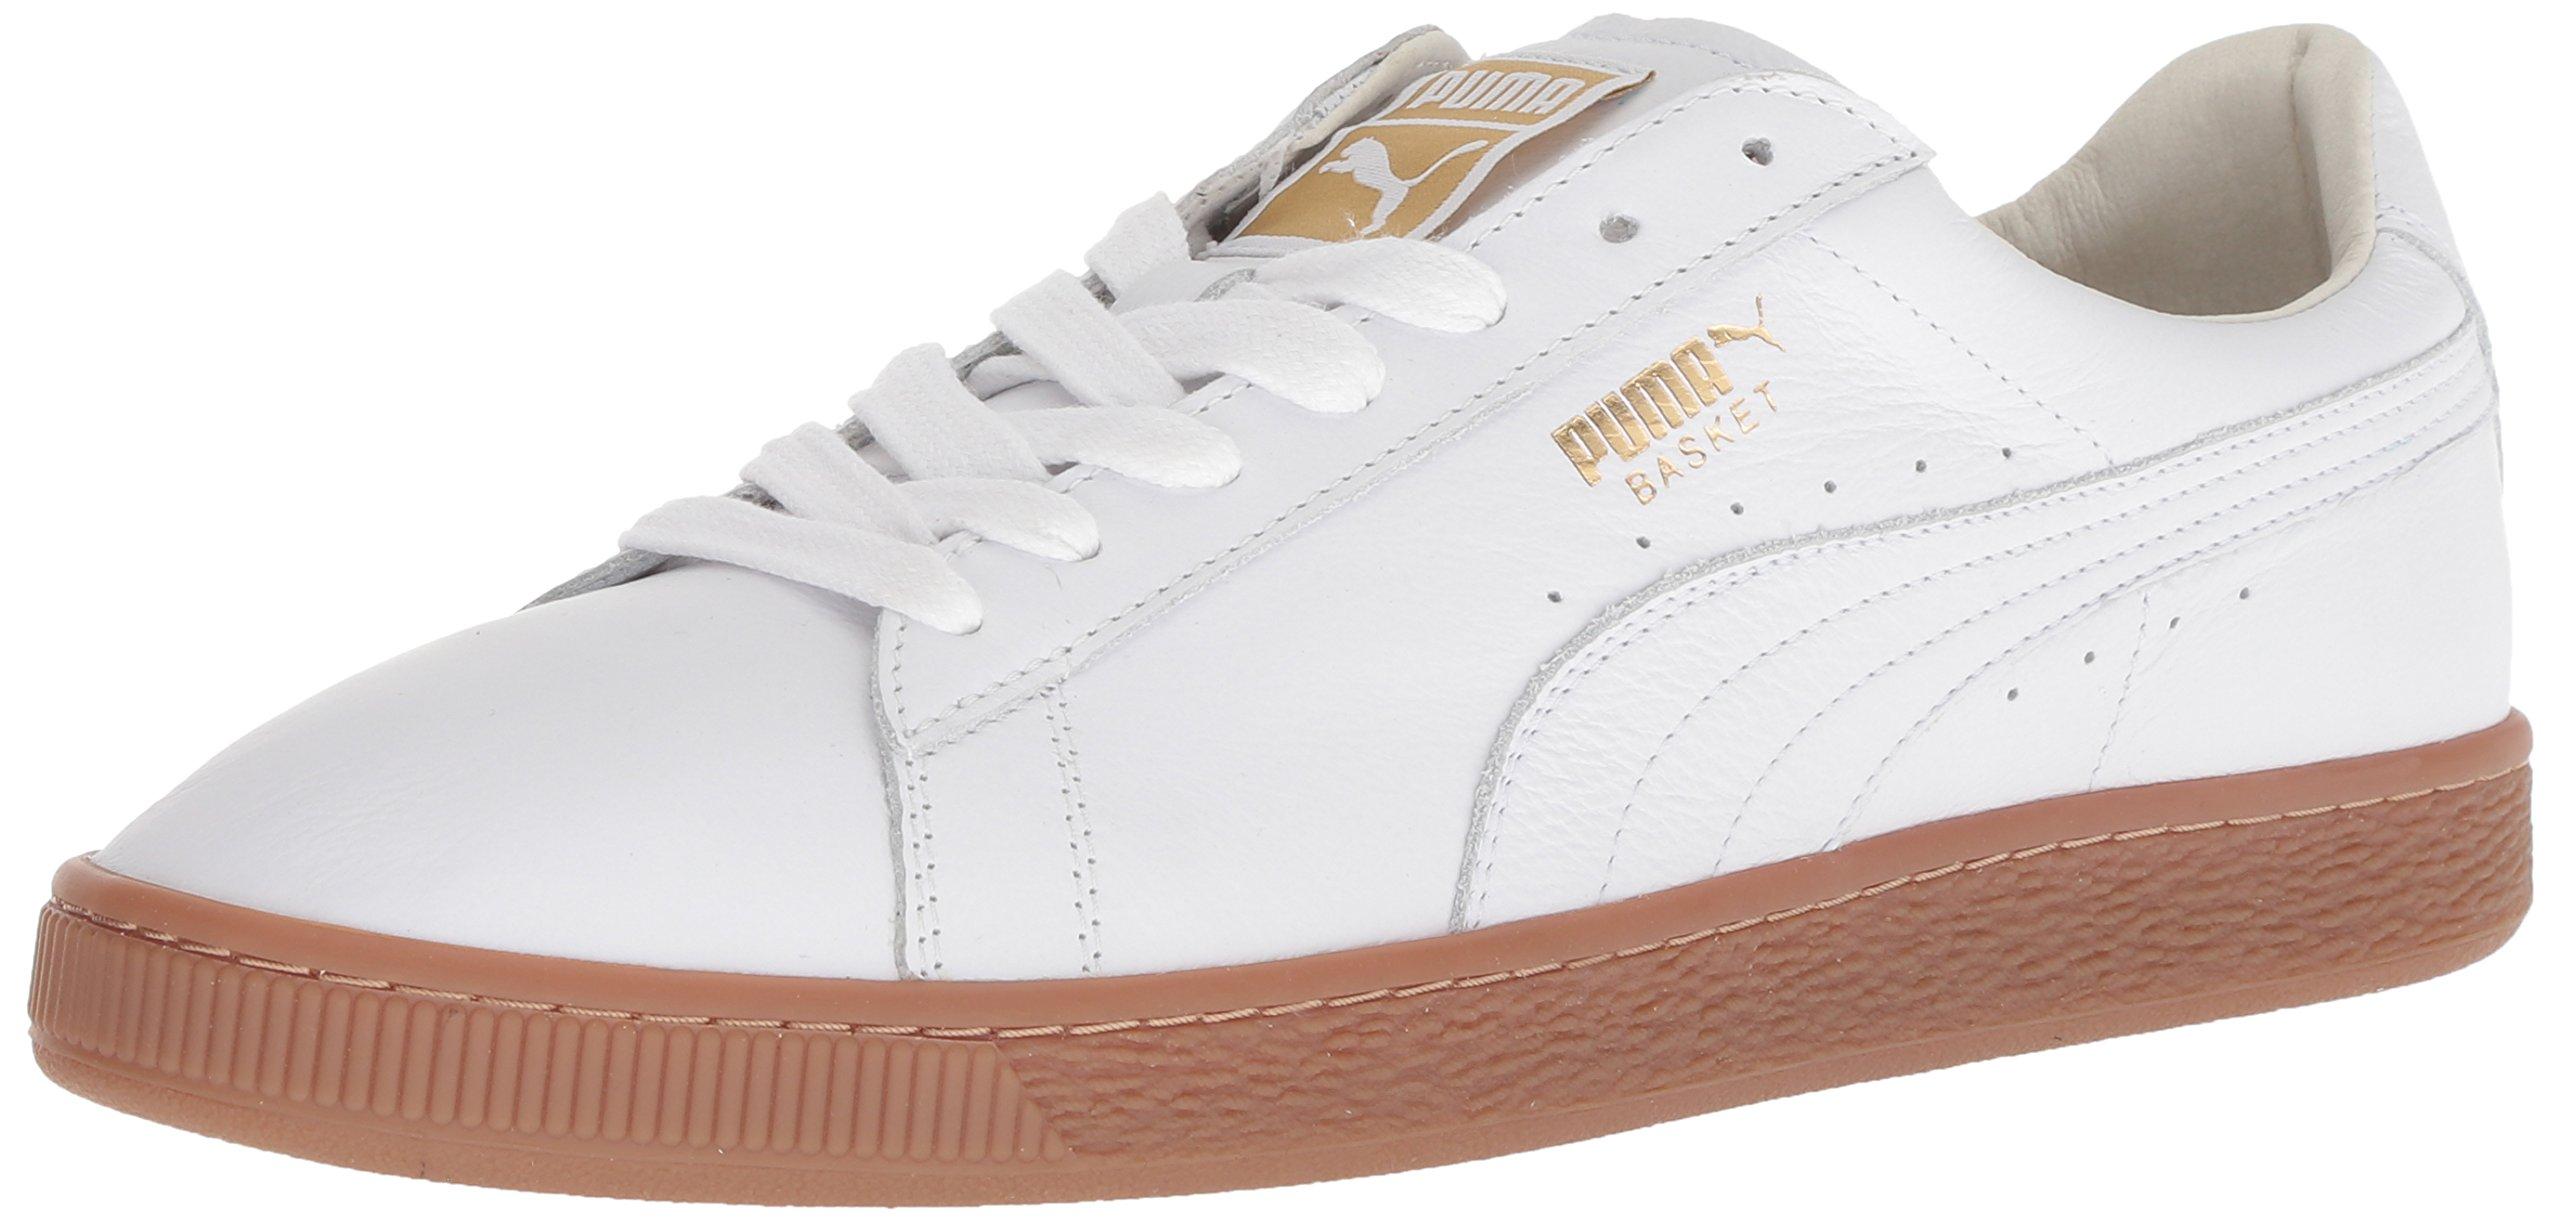 4d41b95631cc Galleon - PUMA Men s Basket Classic Gum Deluxe Sneaker